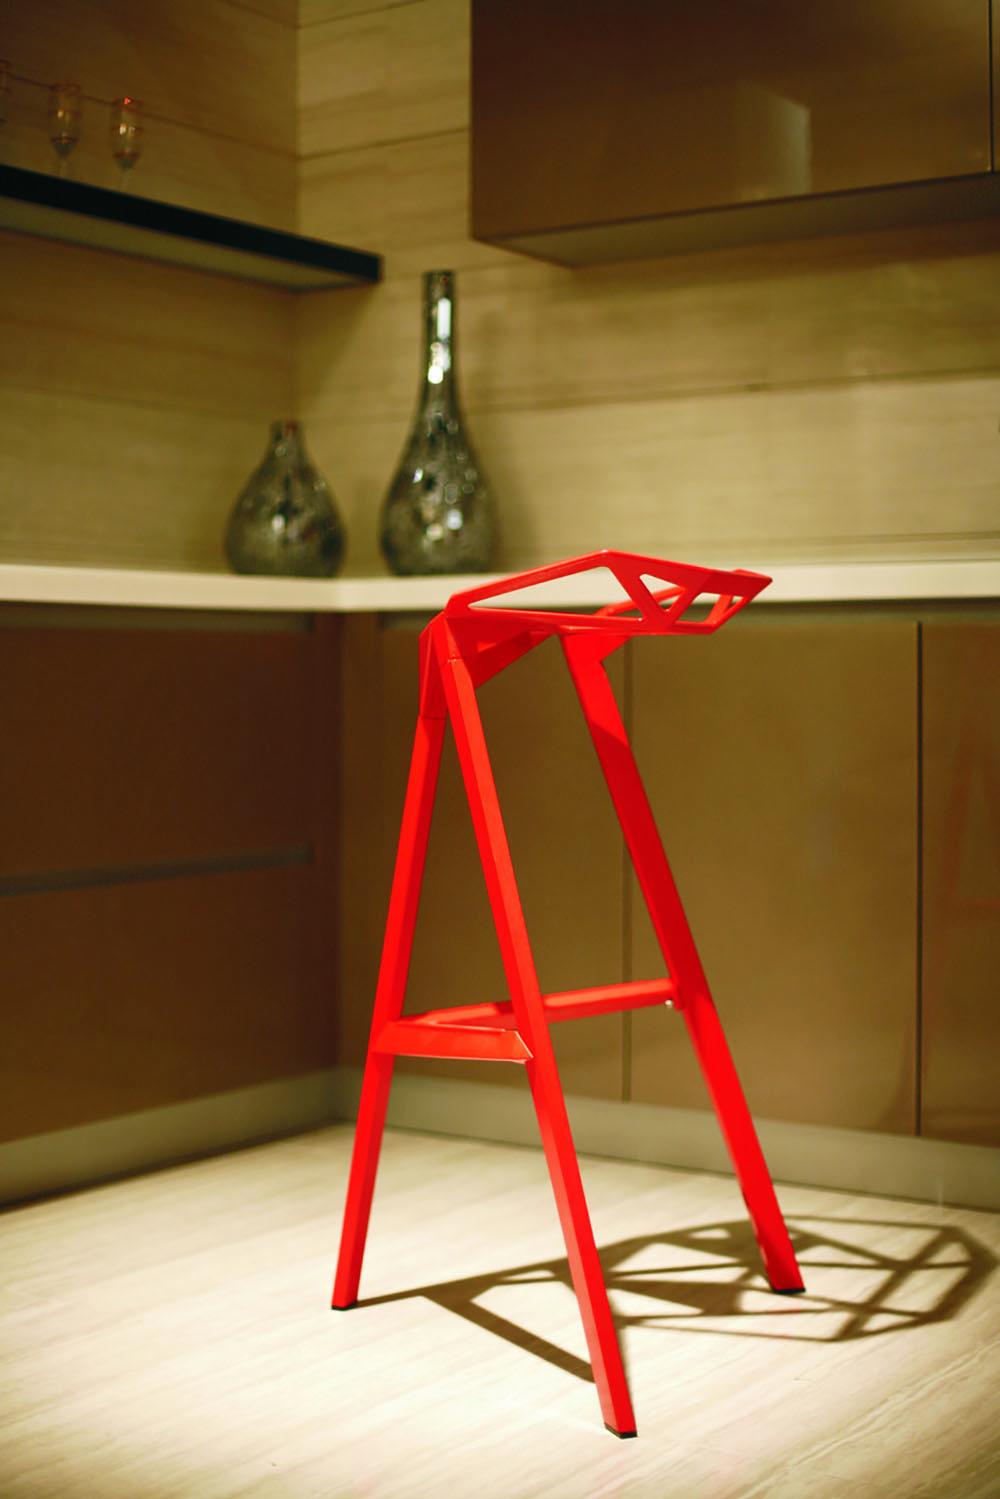 Tabouret — Interieur Stool Littoz One ARL45j